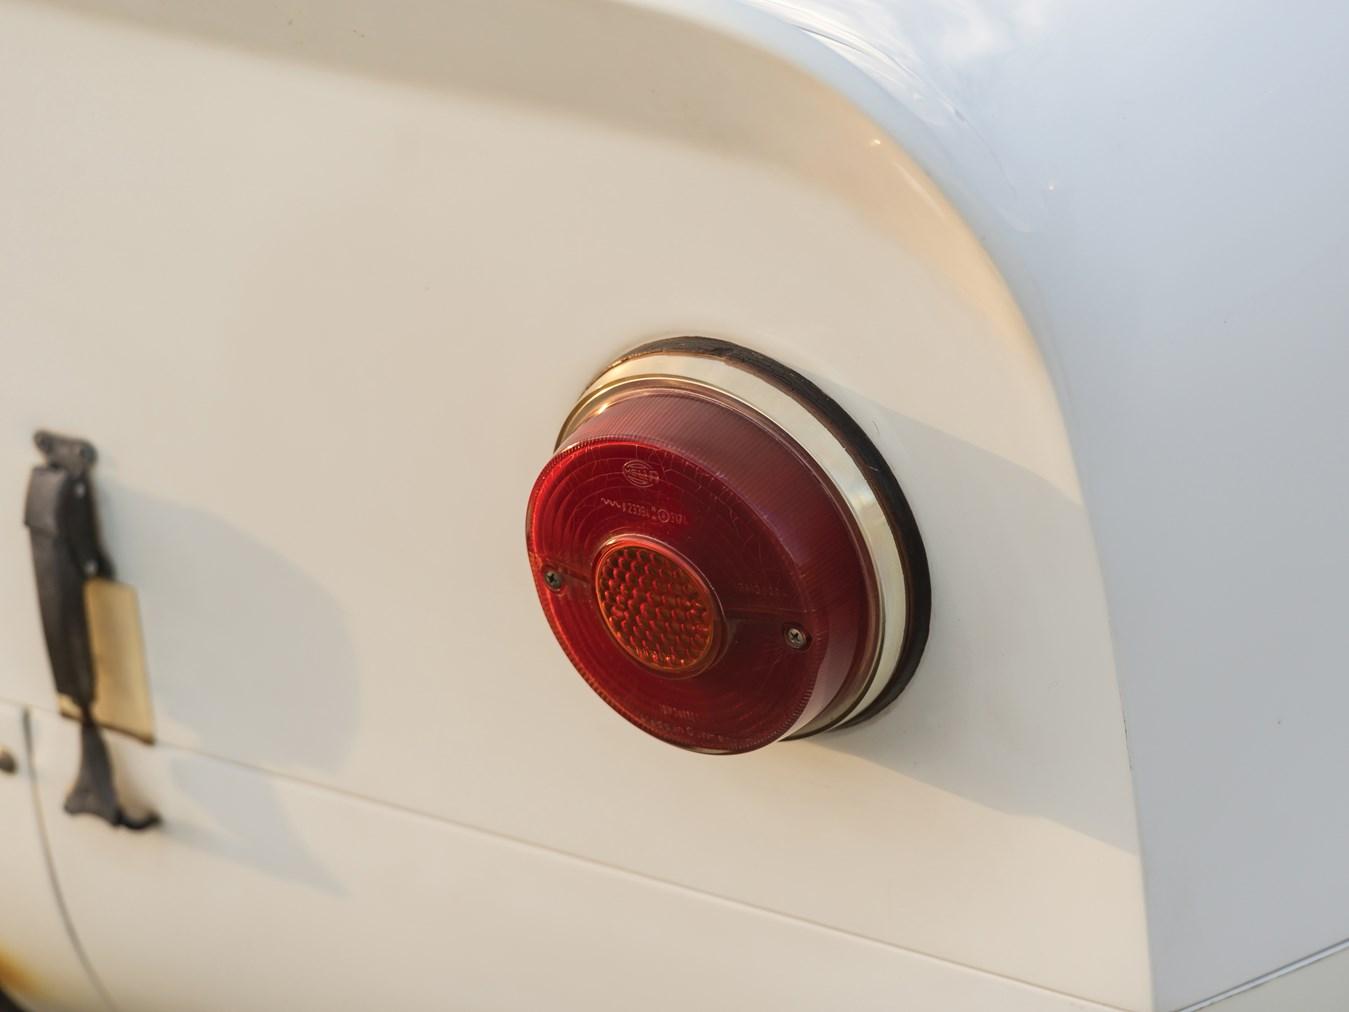 1968 Porsche 908 Works 'Short-Tail' Coupe